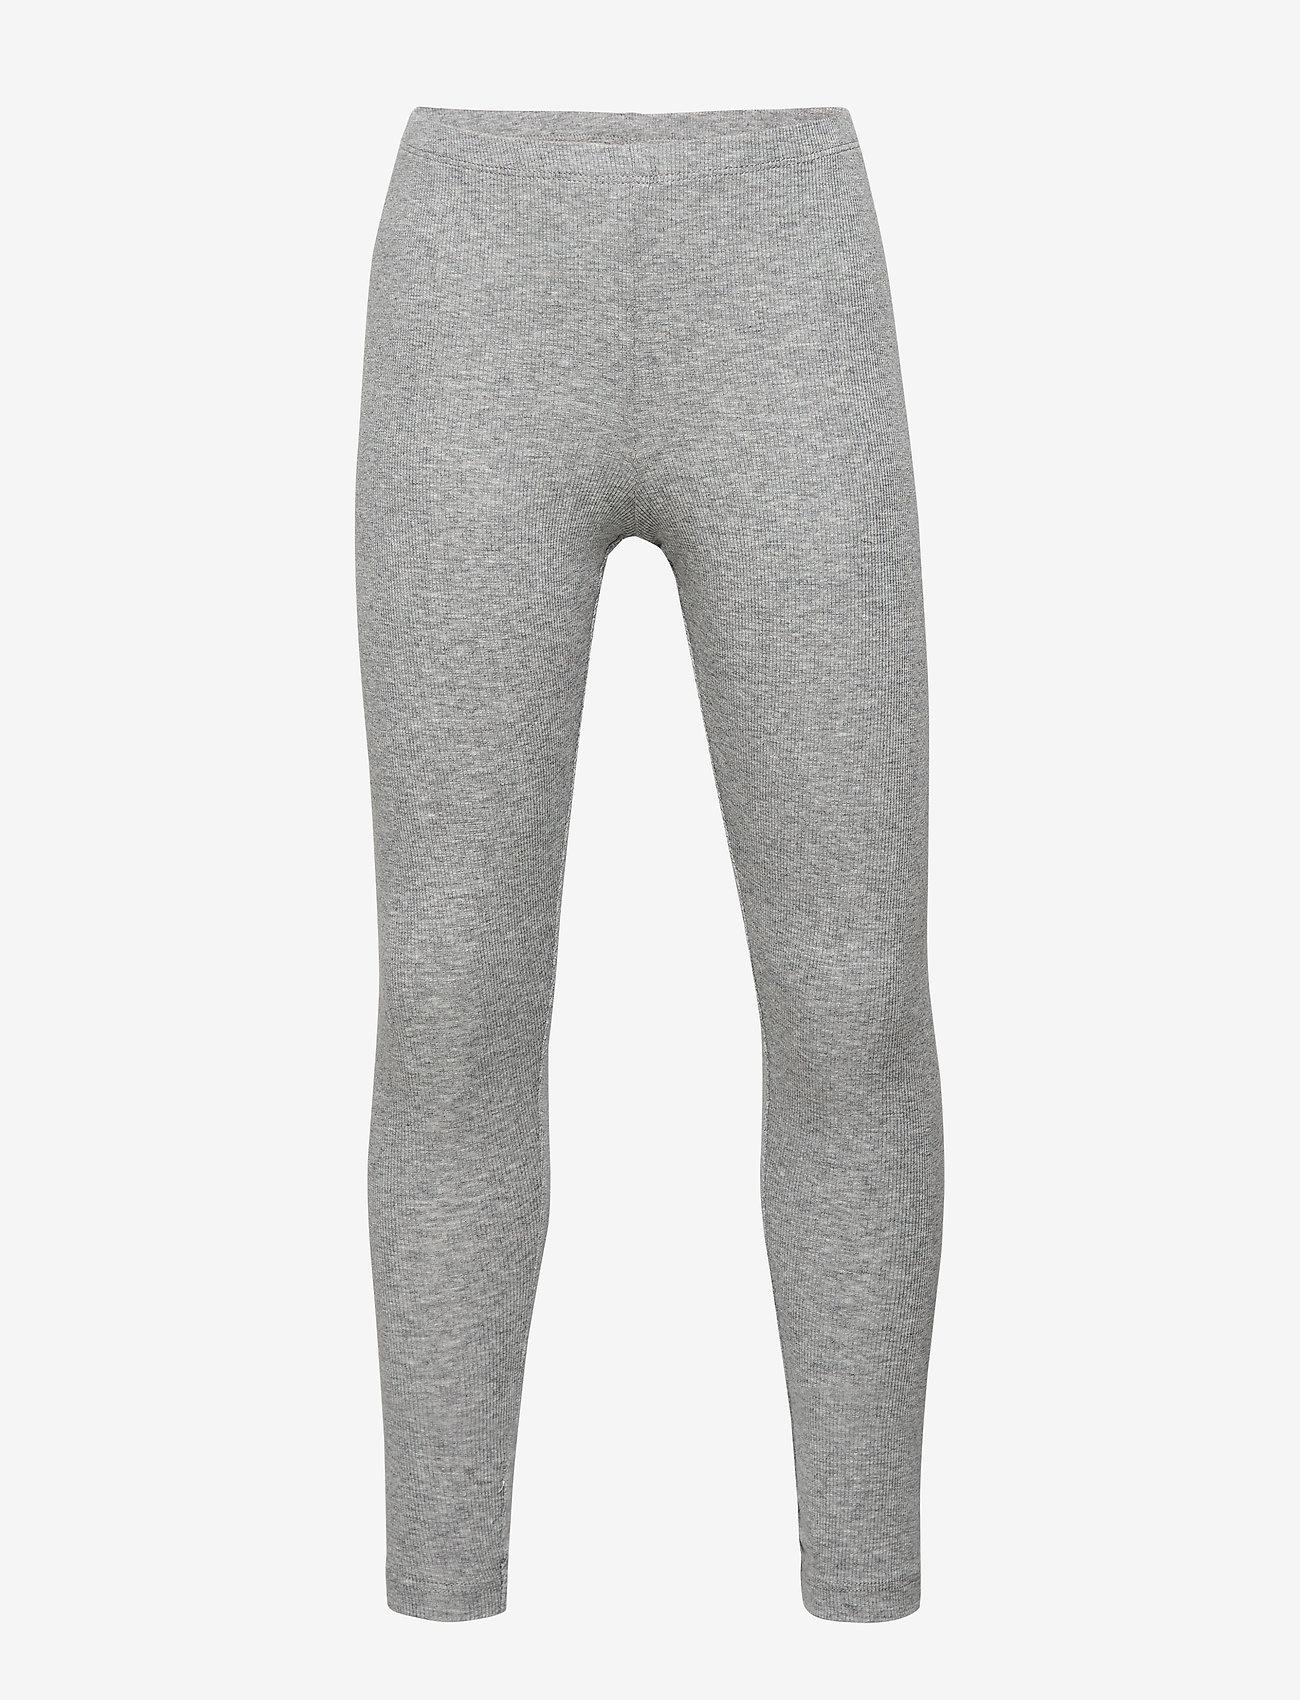 Wheat - Rib Leggings - leginsy - melange grey